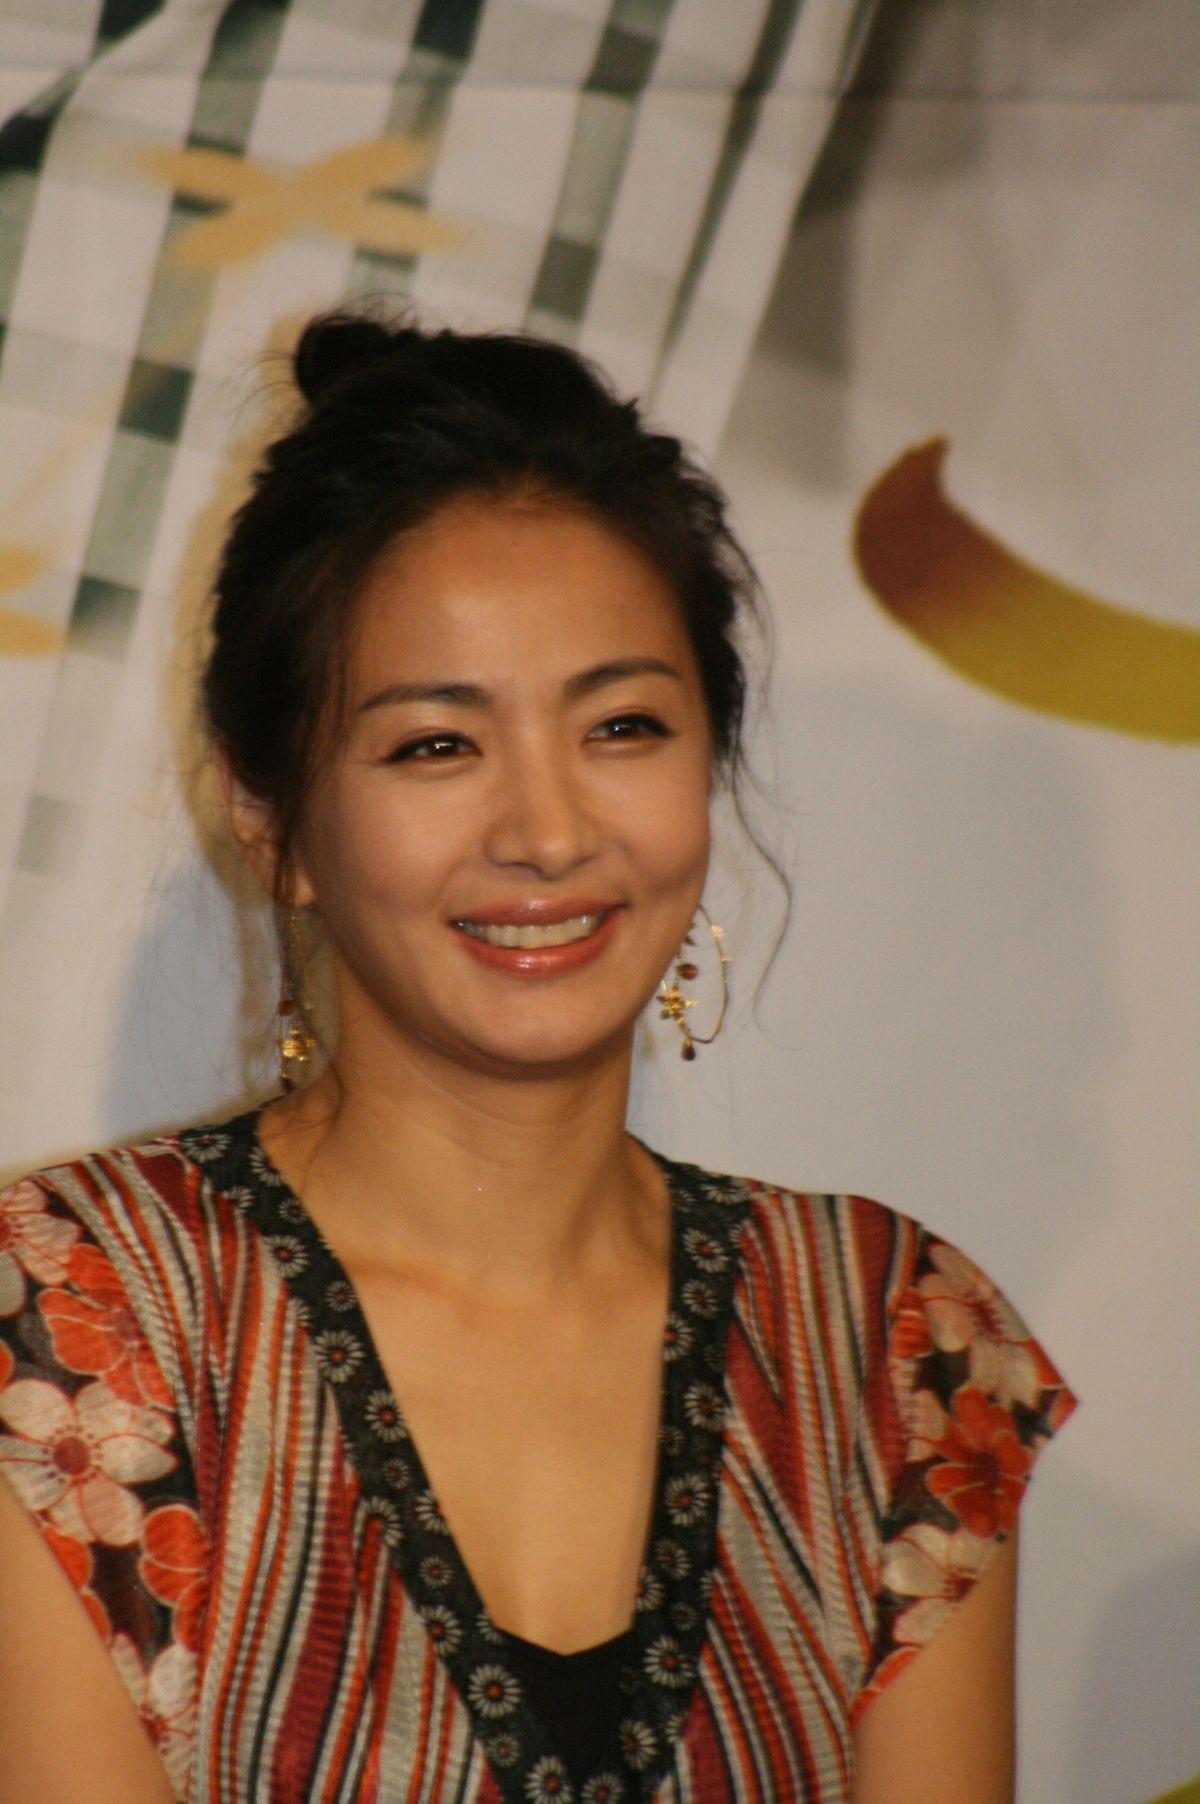 Yoon Hae young